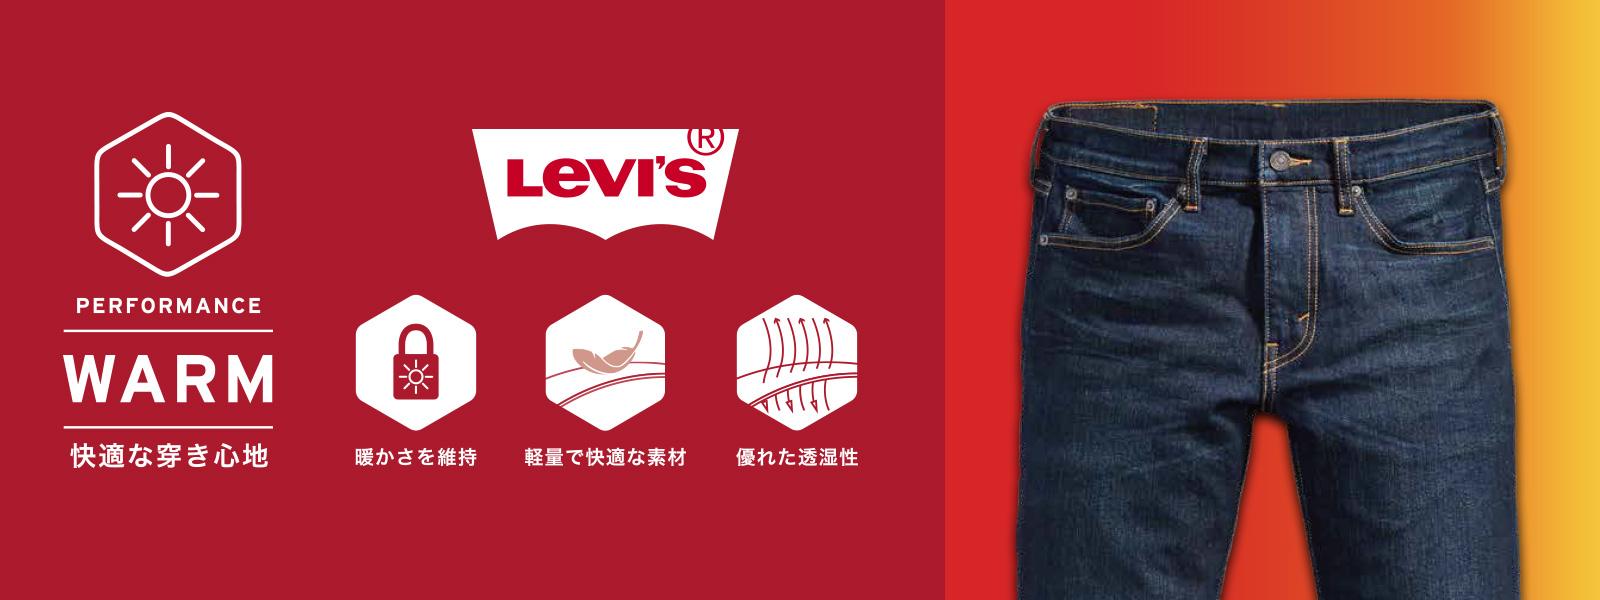 Levi's WARMシリーズ